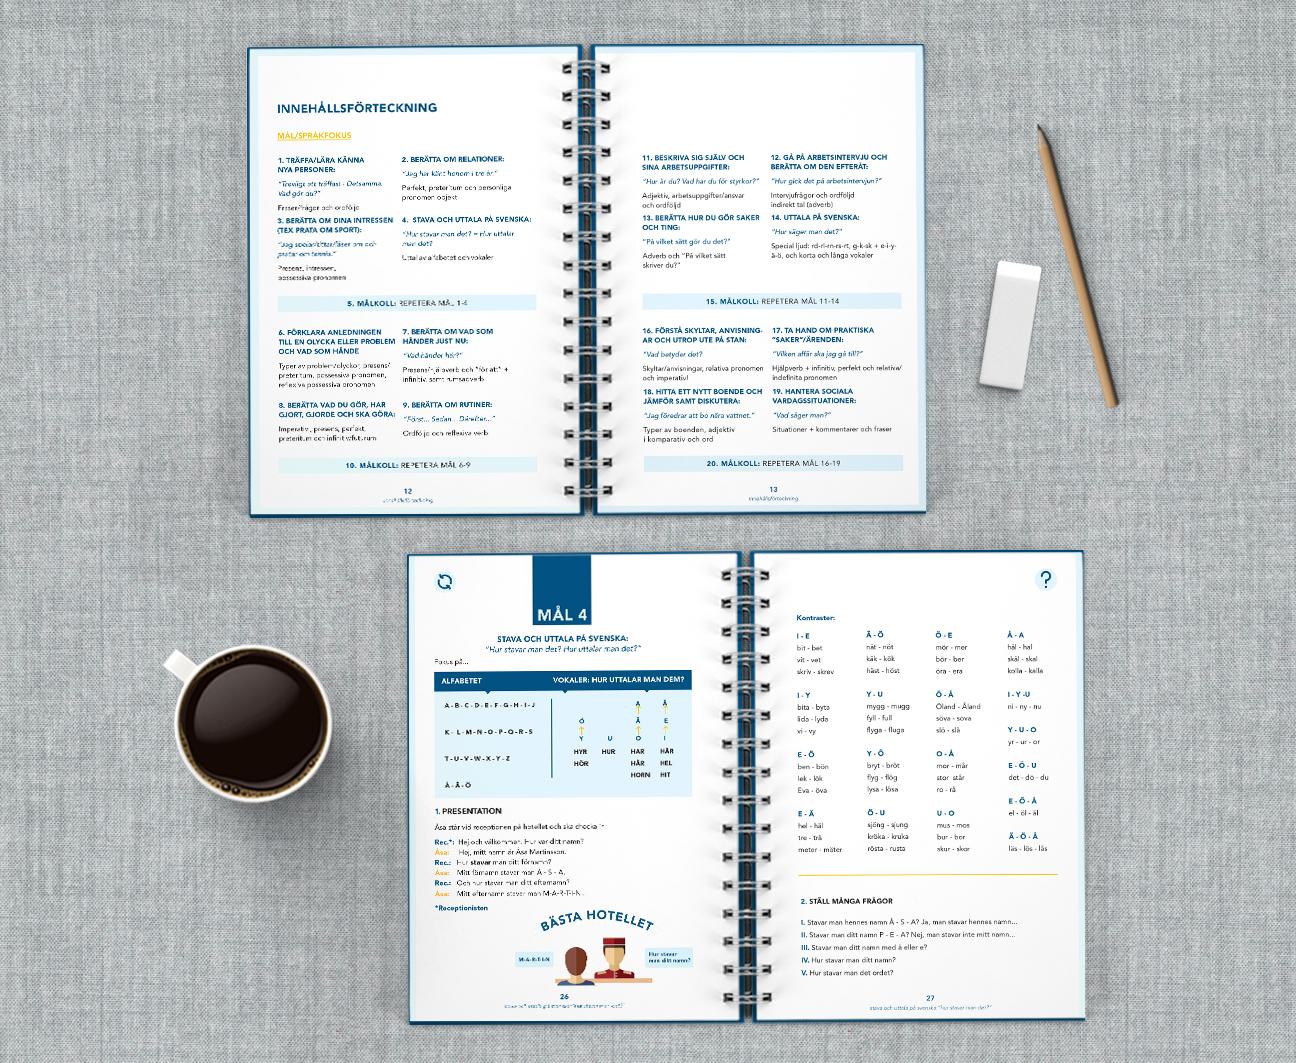 svenska3-openbook-editorial-swedish-berlitz.jpg